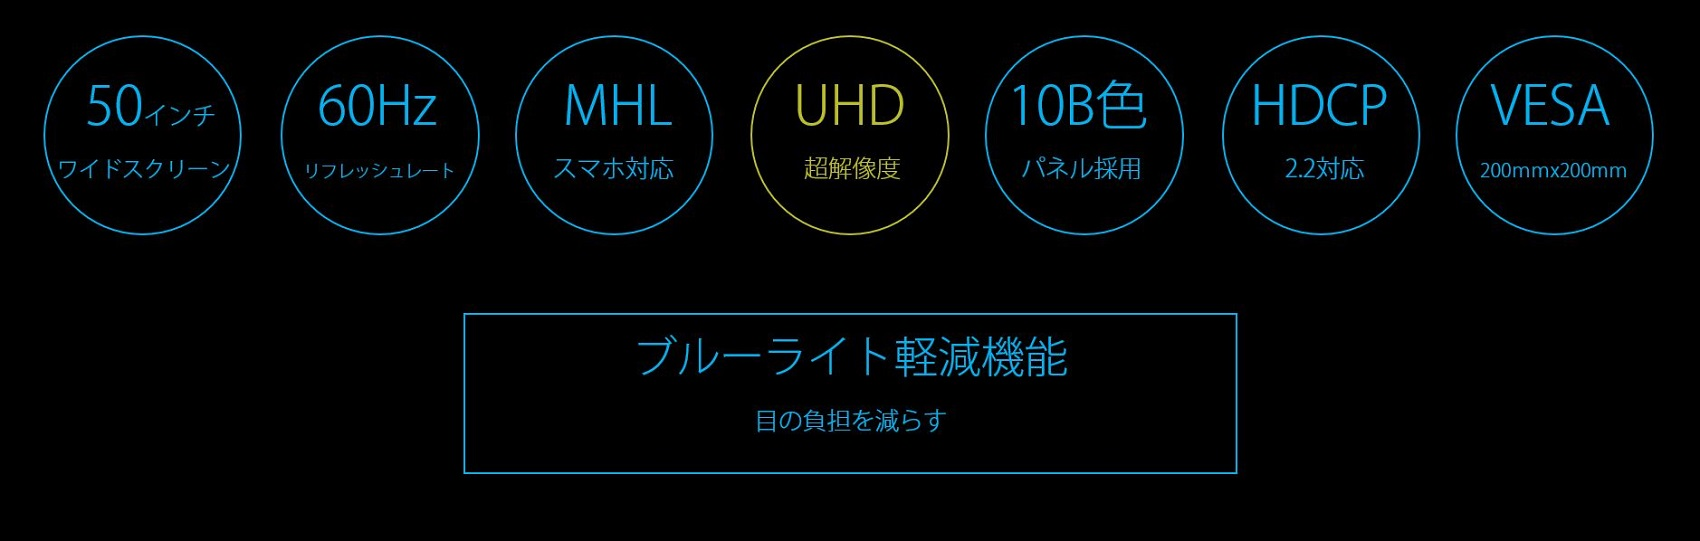 HDCP) (60Hz MHL スマホ対応 UHD) 10B色) PIP/PBP) ( VESA MULTIWINDOW 2.2対応 リフレッシュ 超解像度 パネル採用 100mmx100mm/ ブルーライト軽減機能 目の負担を減らす フリッカーフリー 体の負担を軽減